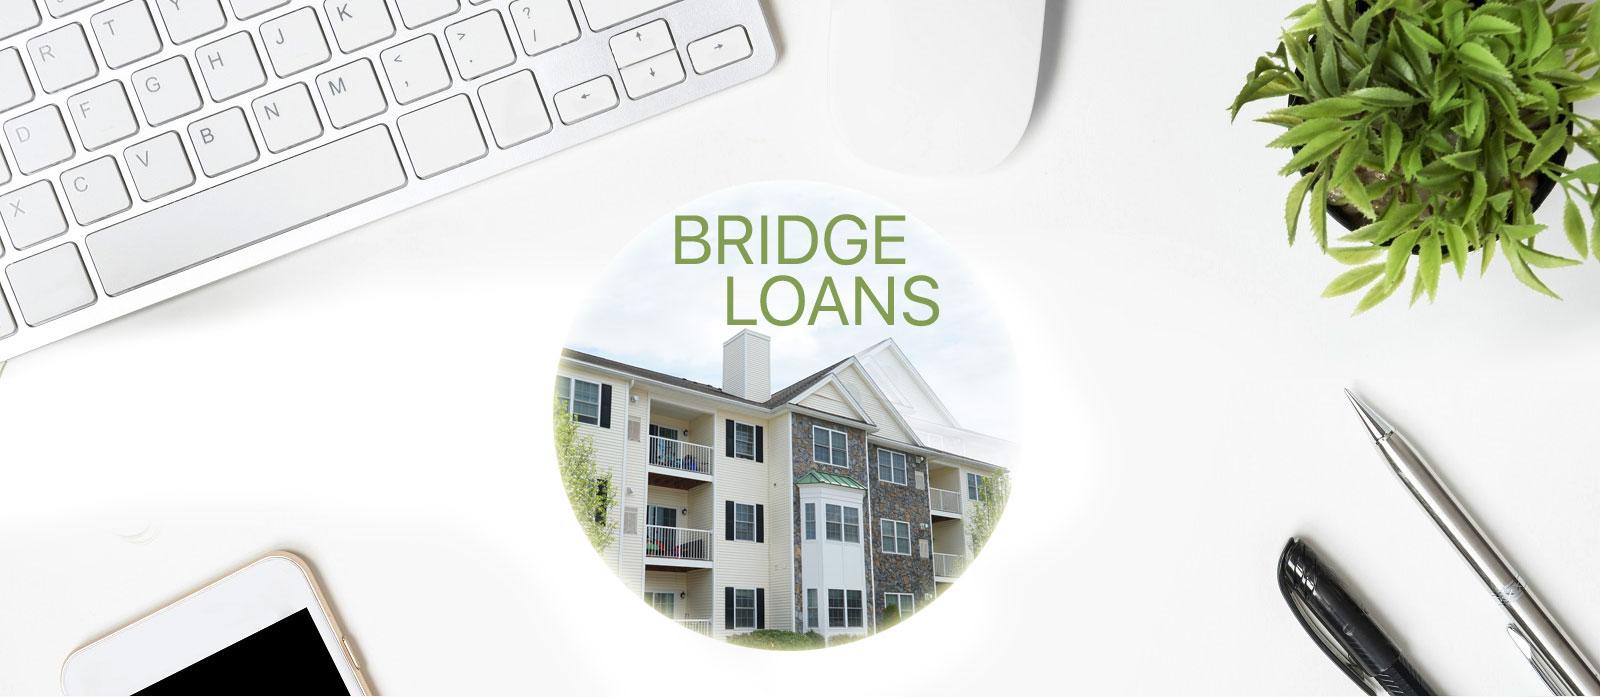 How Does a Bridge Loan Work?